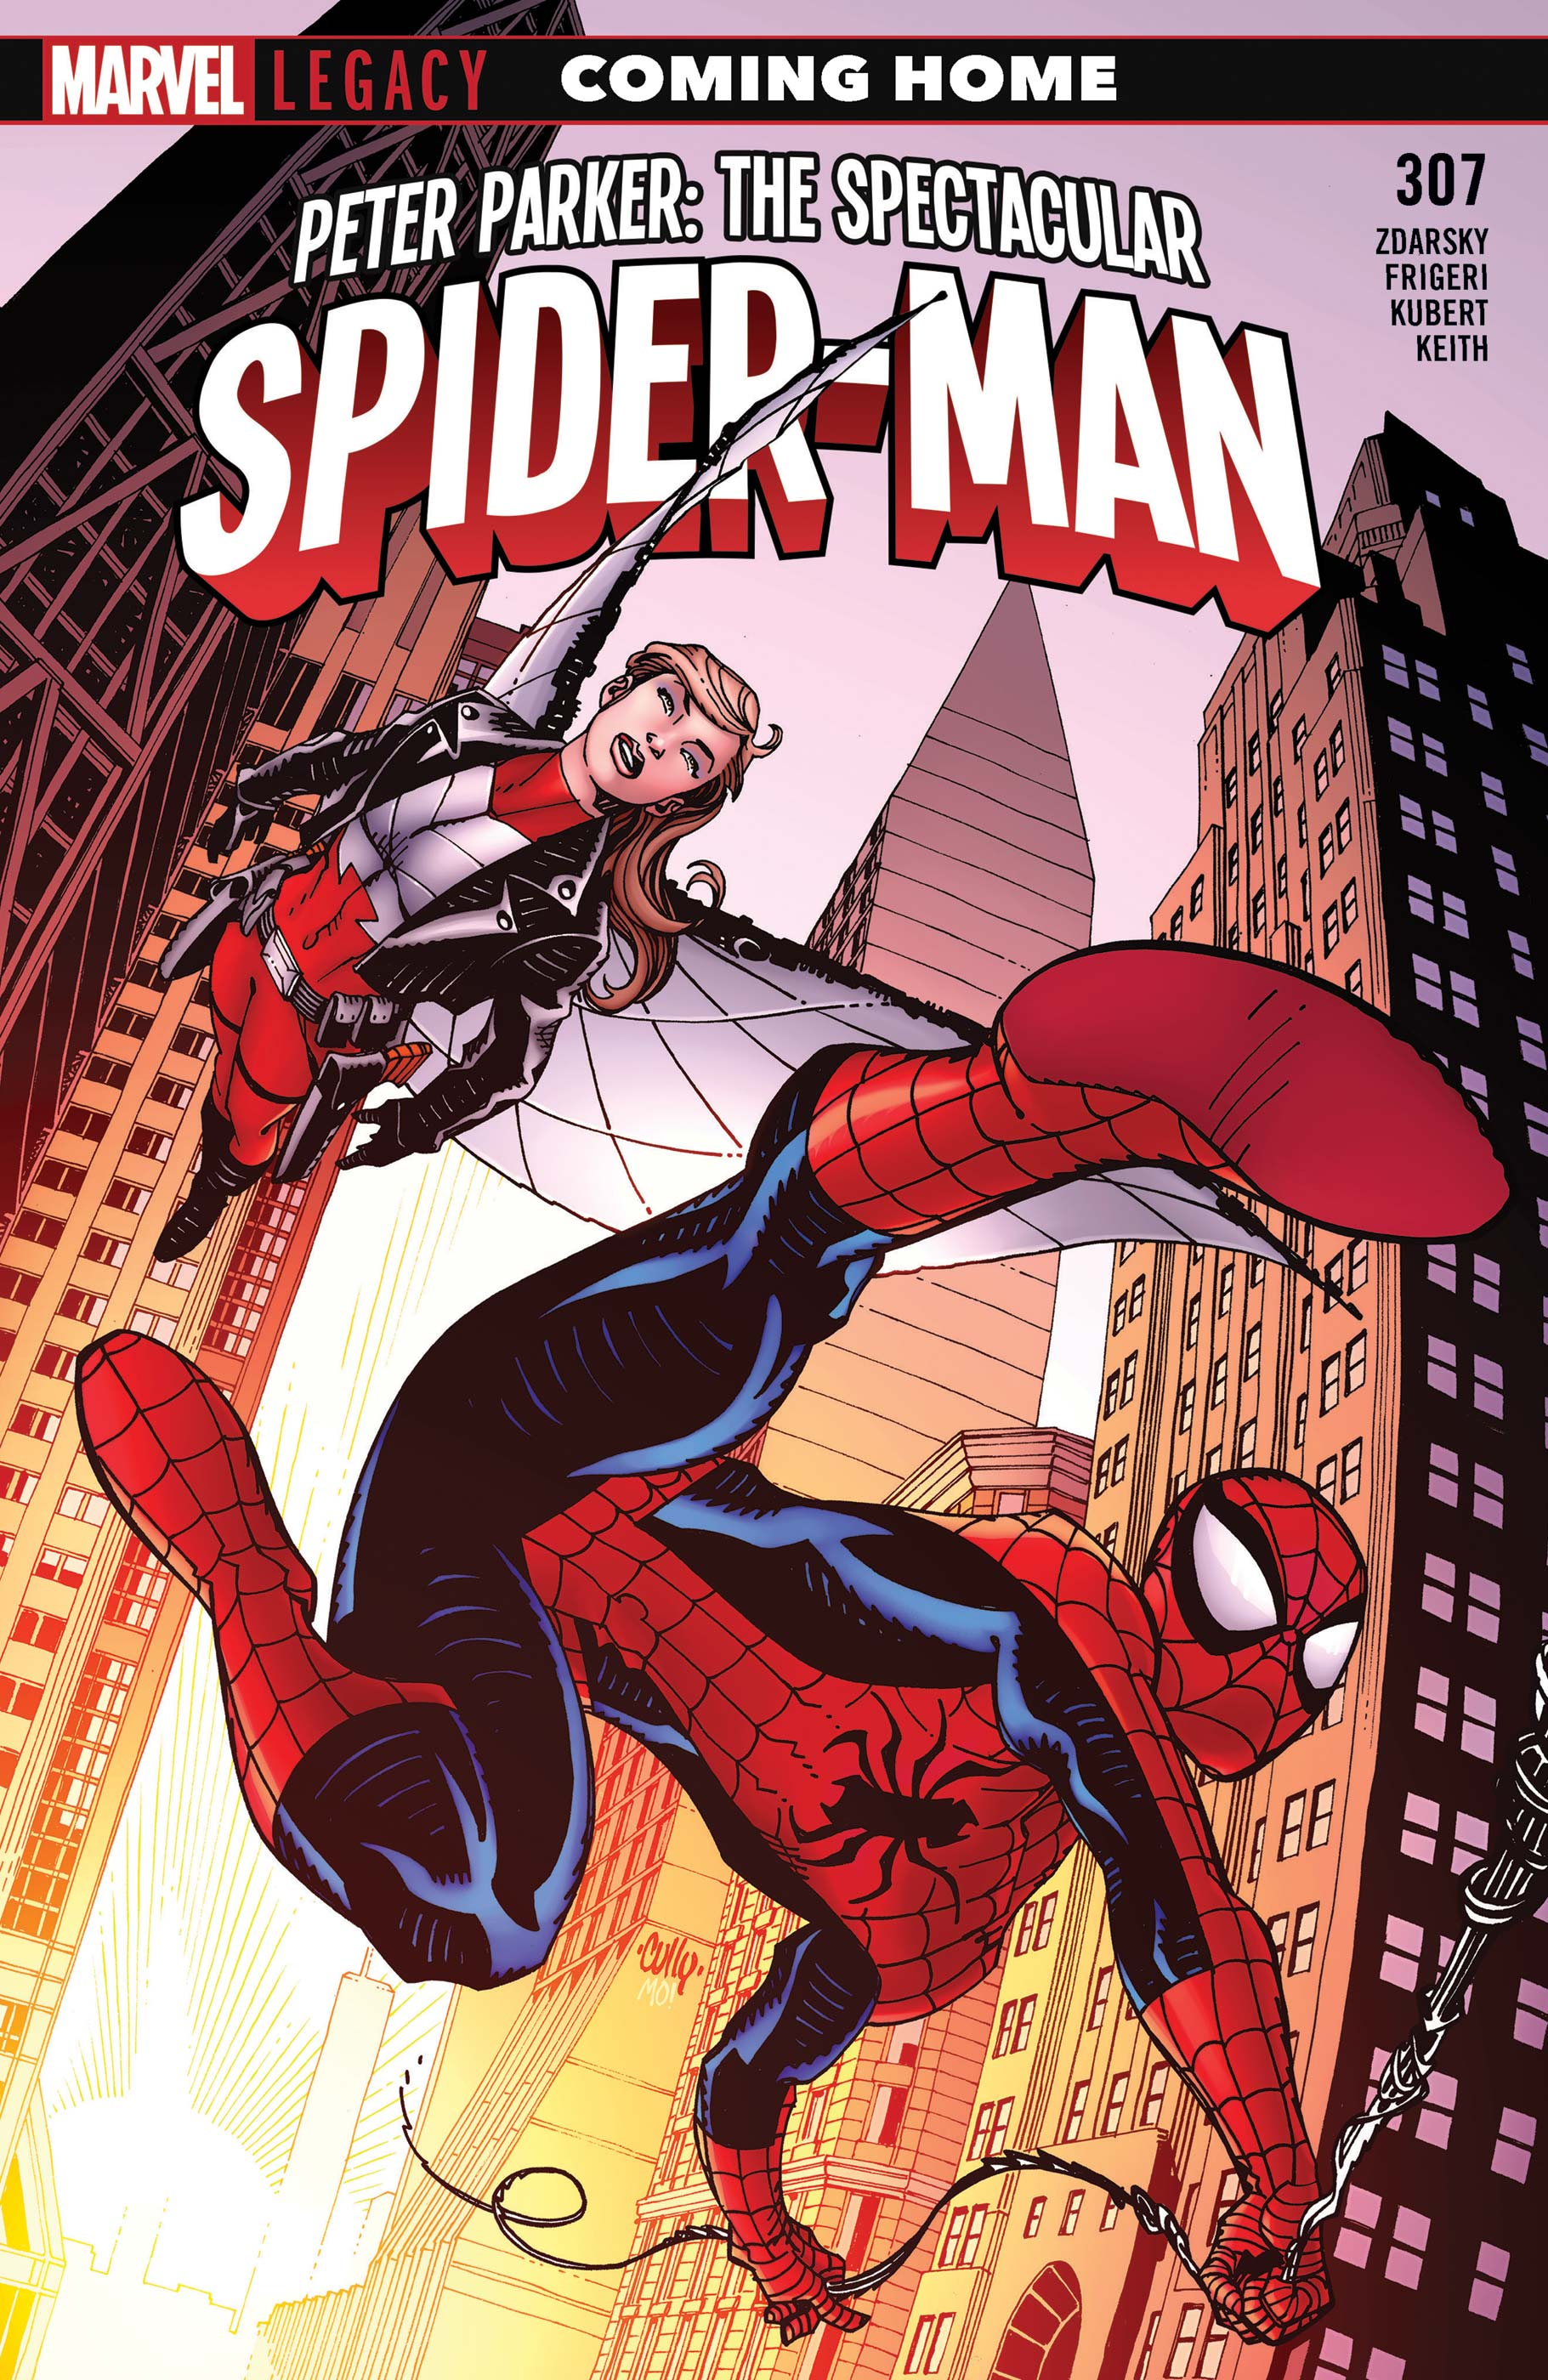 Peter Parker: The Spectacular Spider-Man (2017) #307